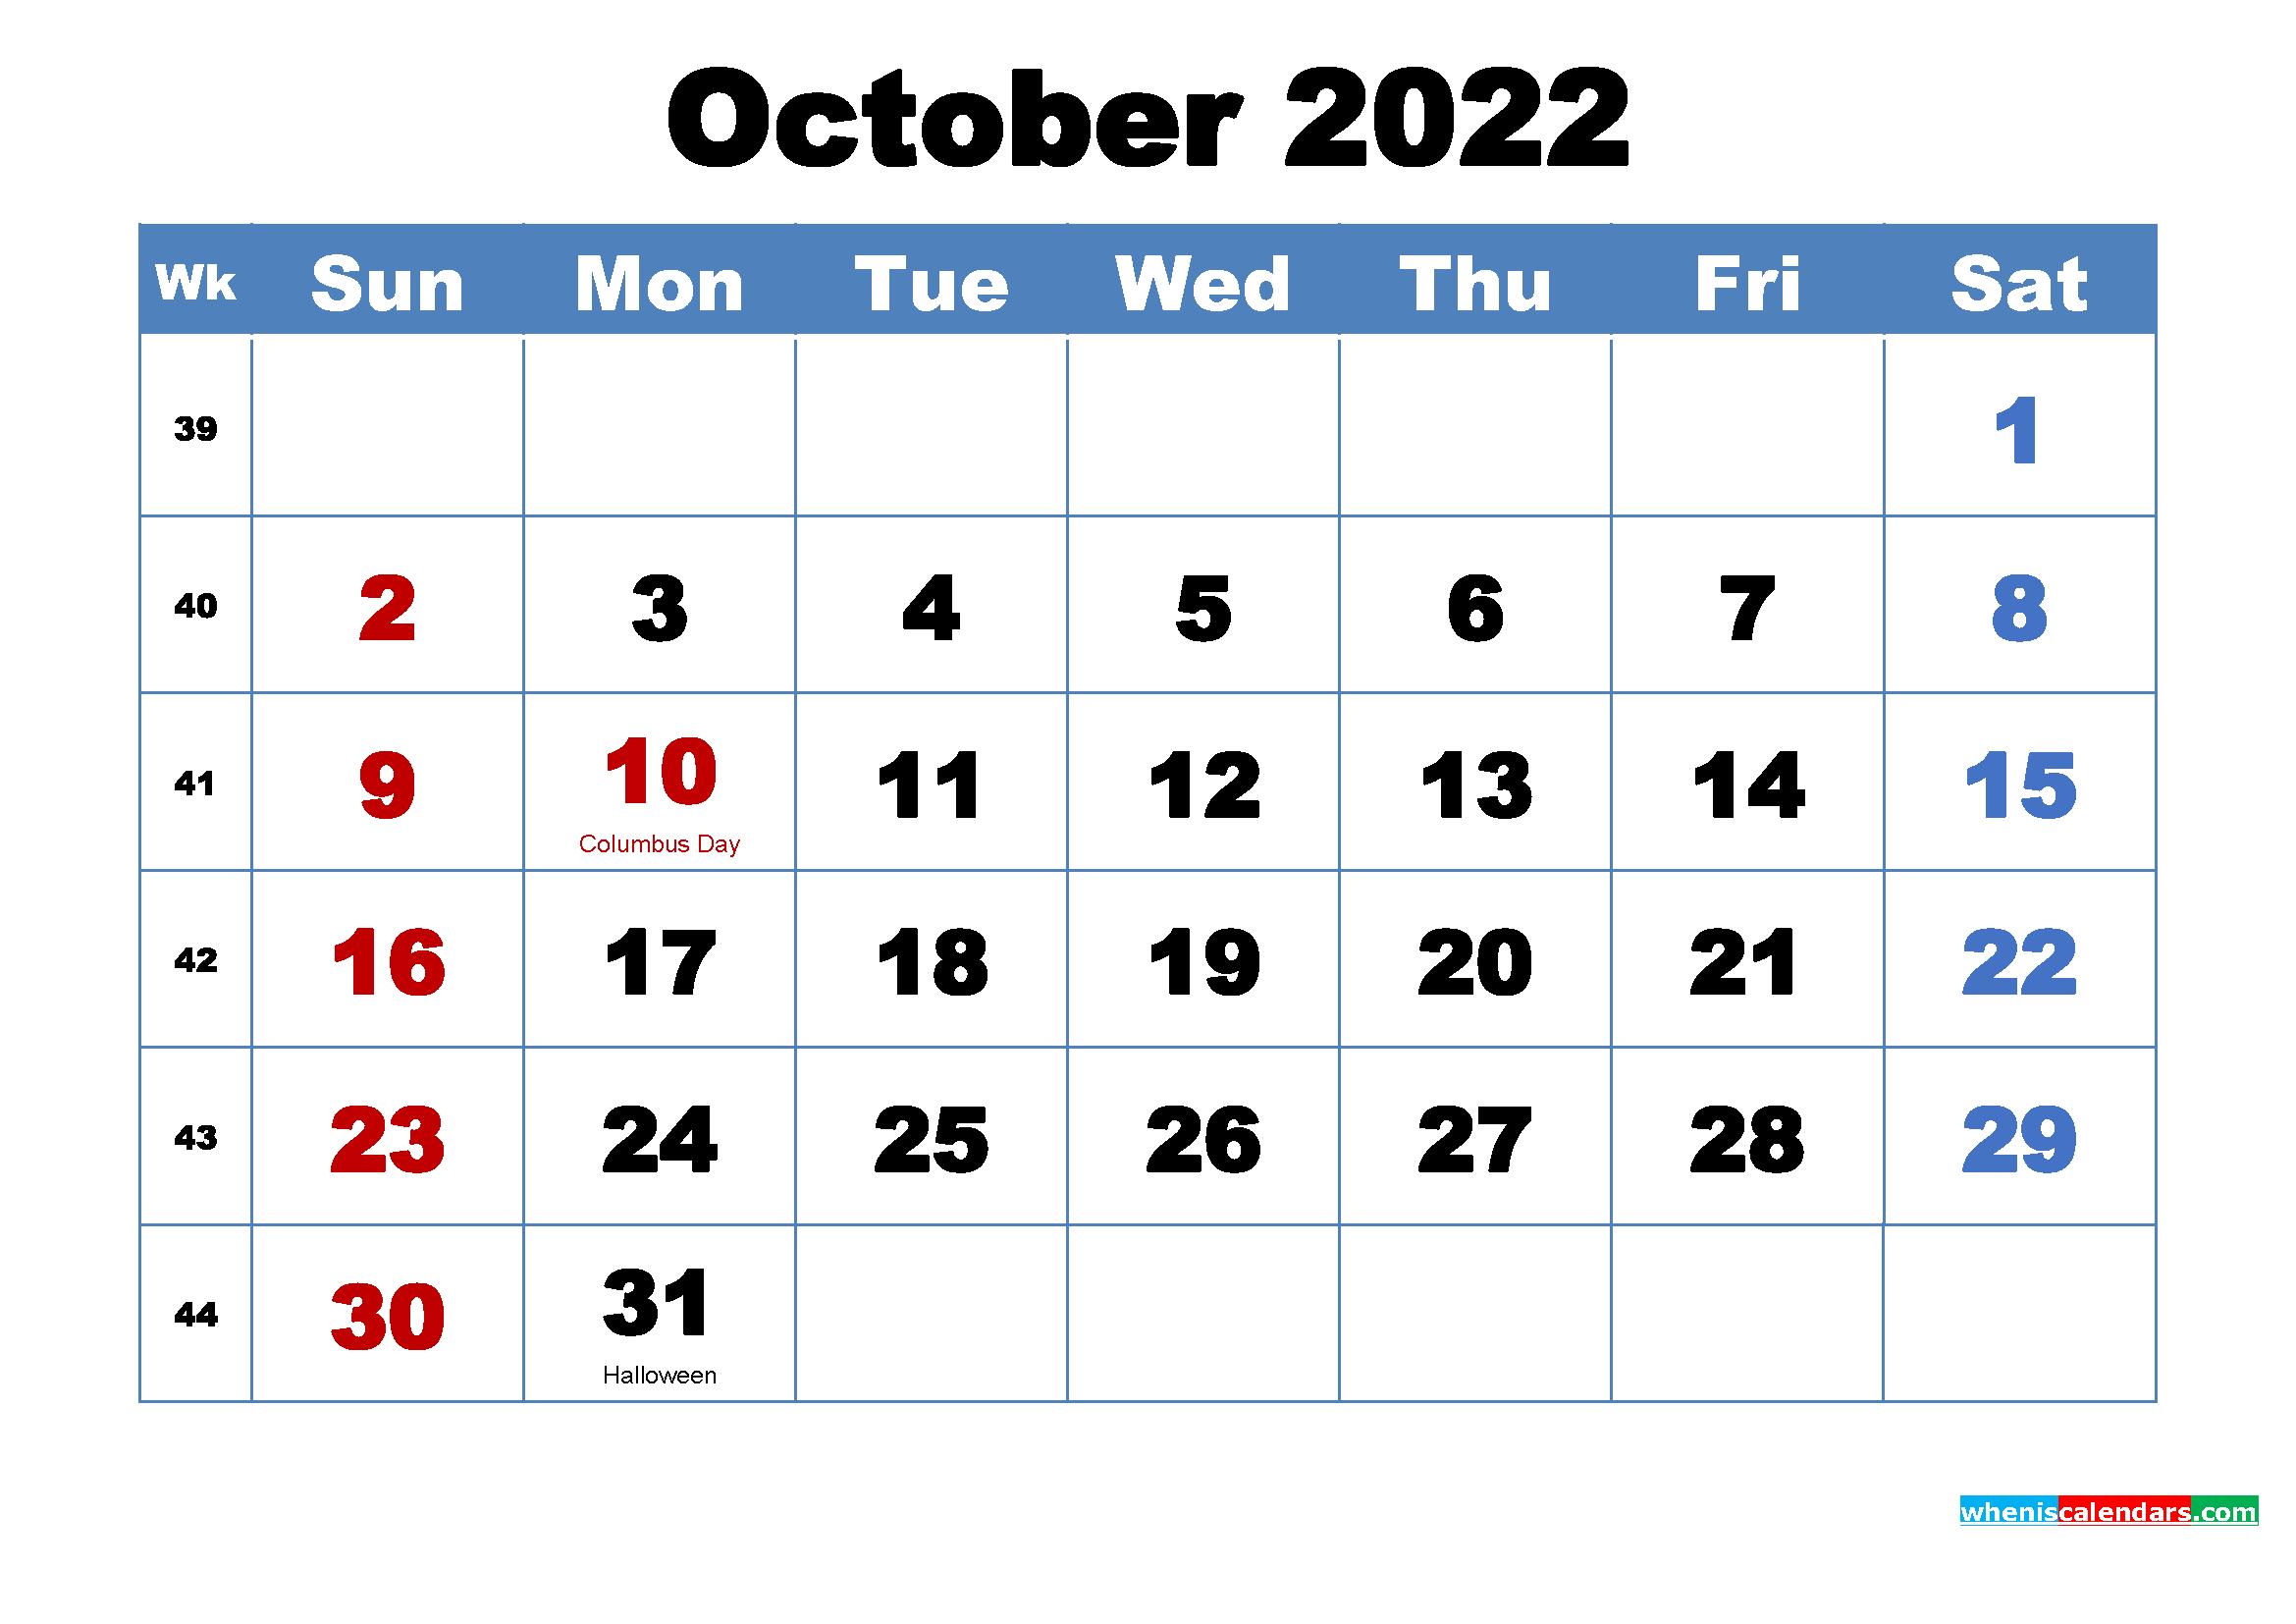 October 2022 Desktop Calendar Free Download